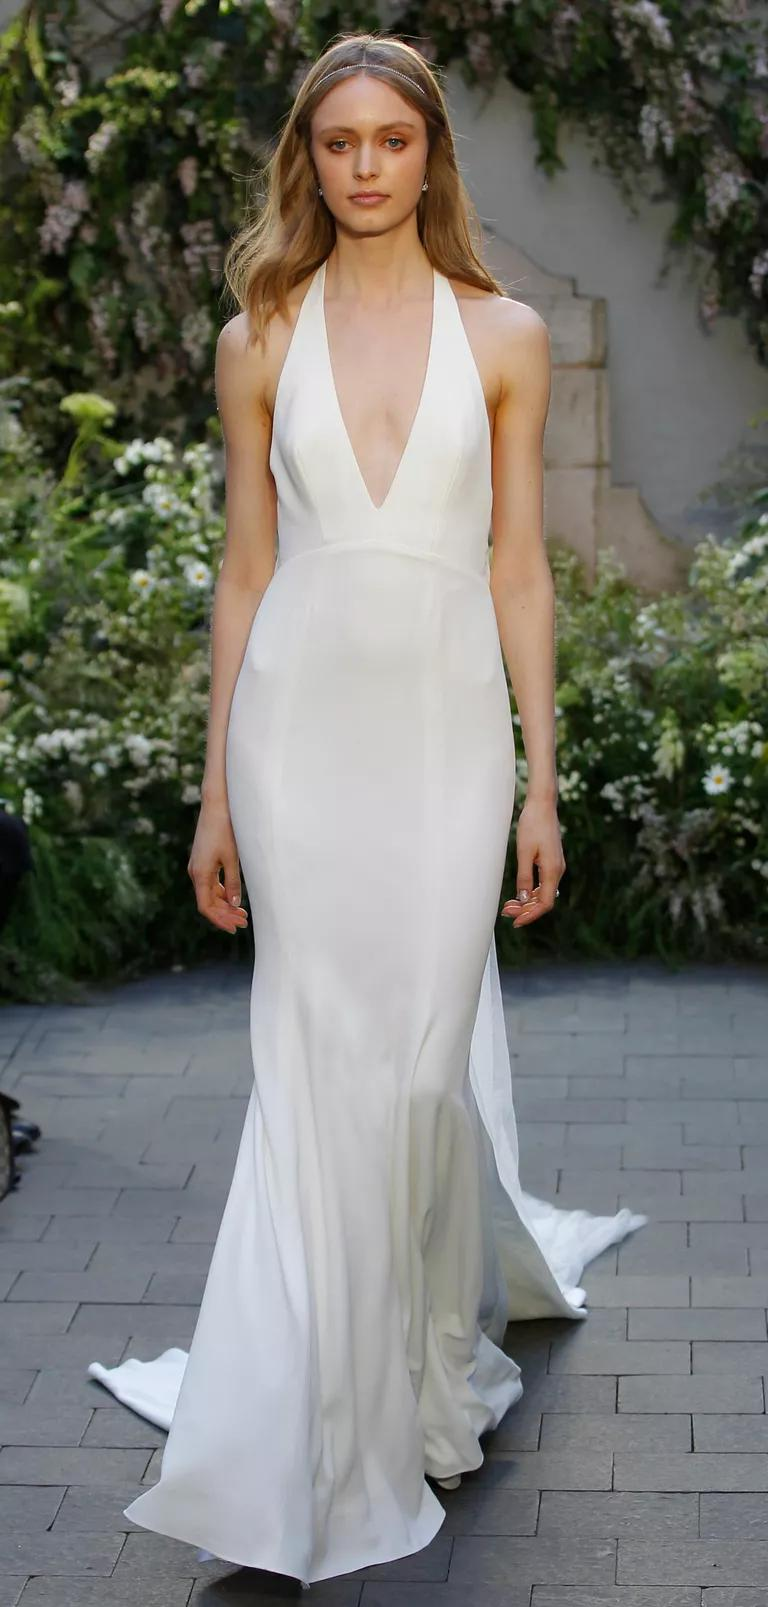 monique lhuillier bridal fashion week spring plunging neckline wedding dress Monique Lhuillier Spring silk white crepe wedding dress with plunging V neck halter